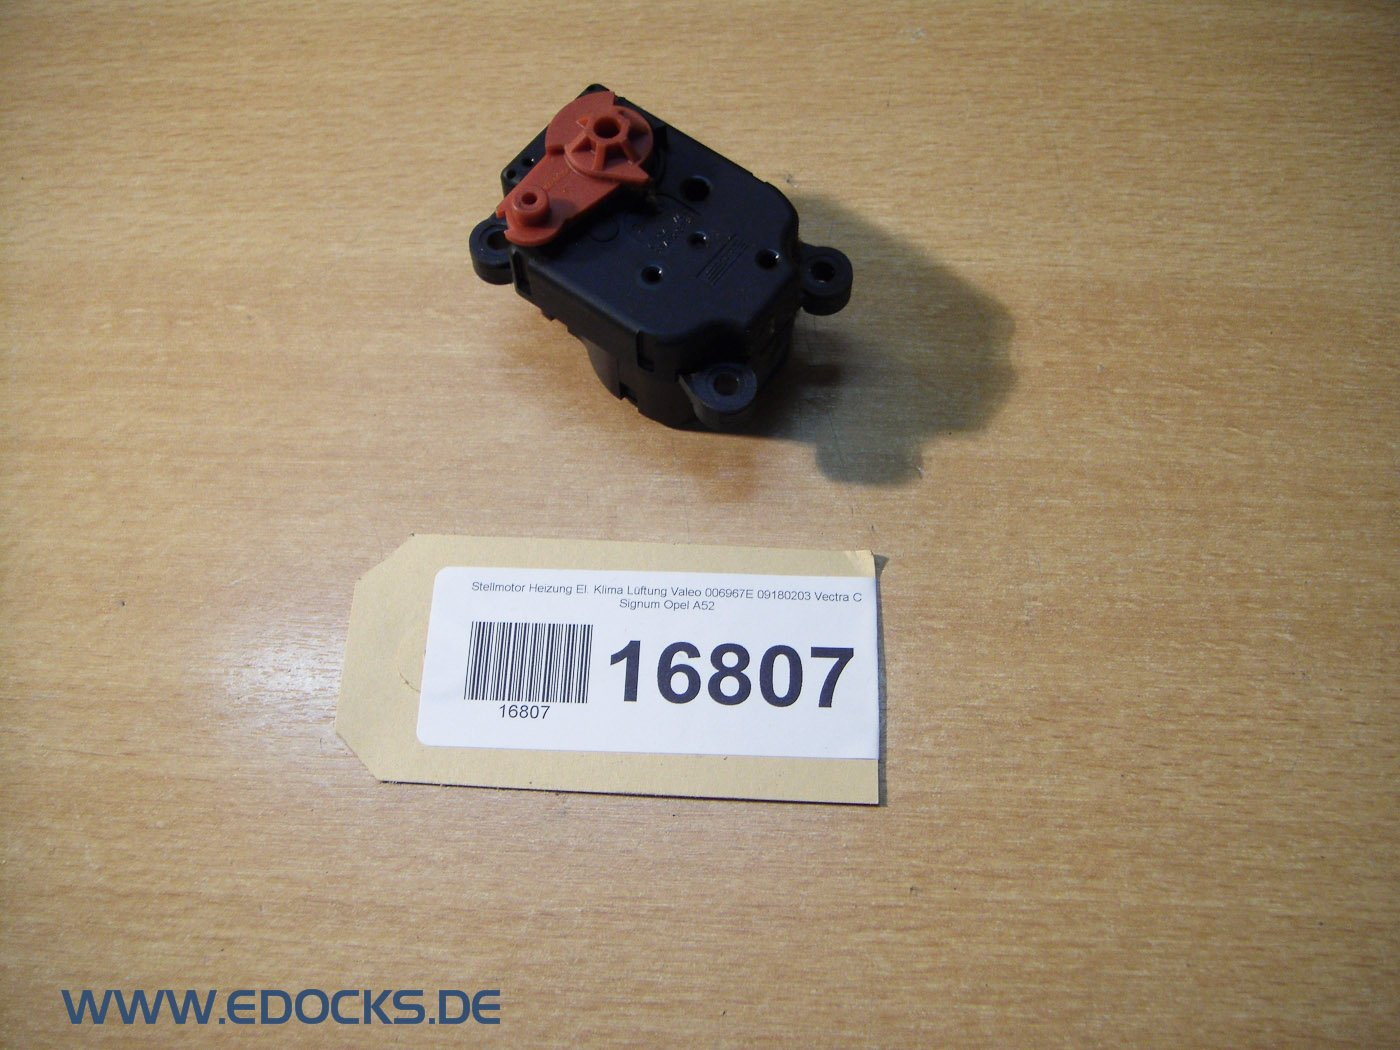 Stellmotor Heizung El Klima L/üftung Valeo 006967E 09180203 Vectra C Signum Opel